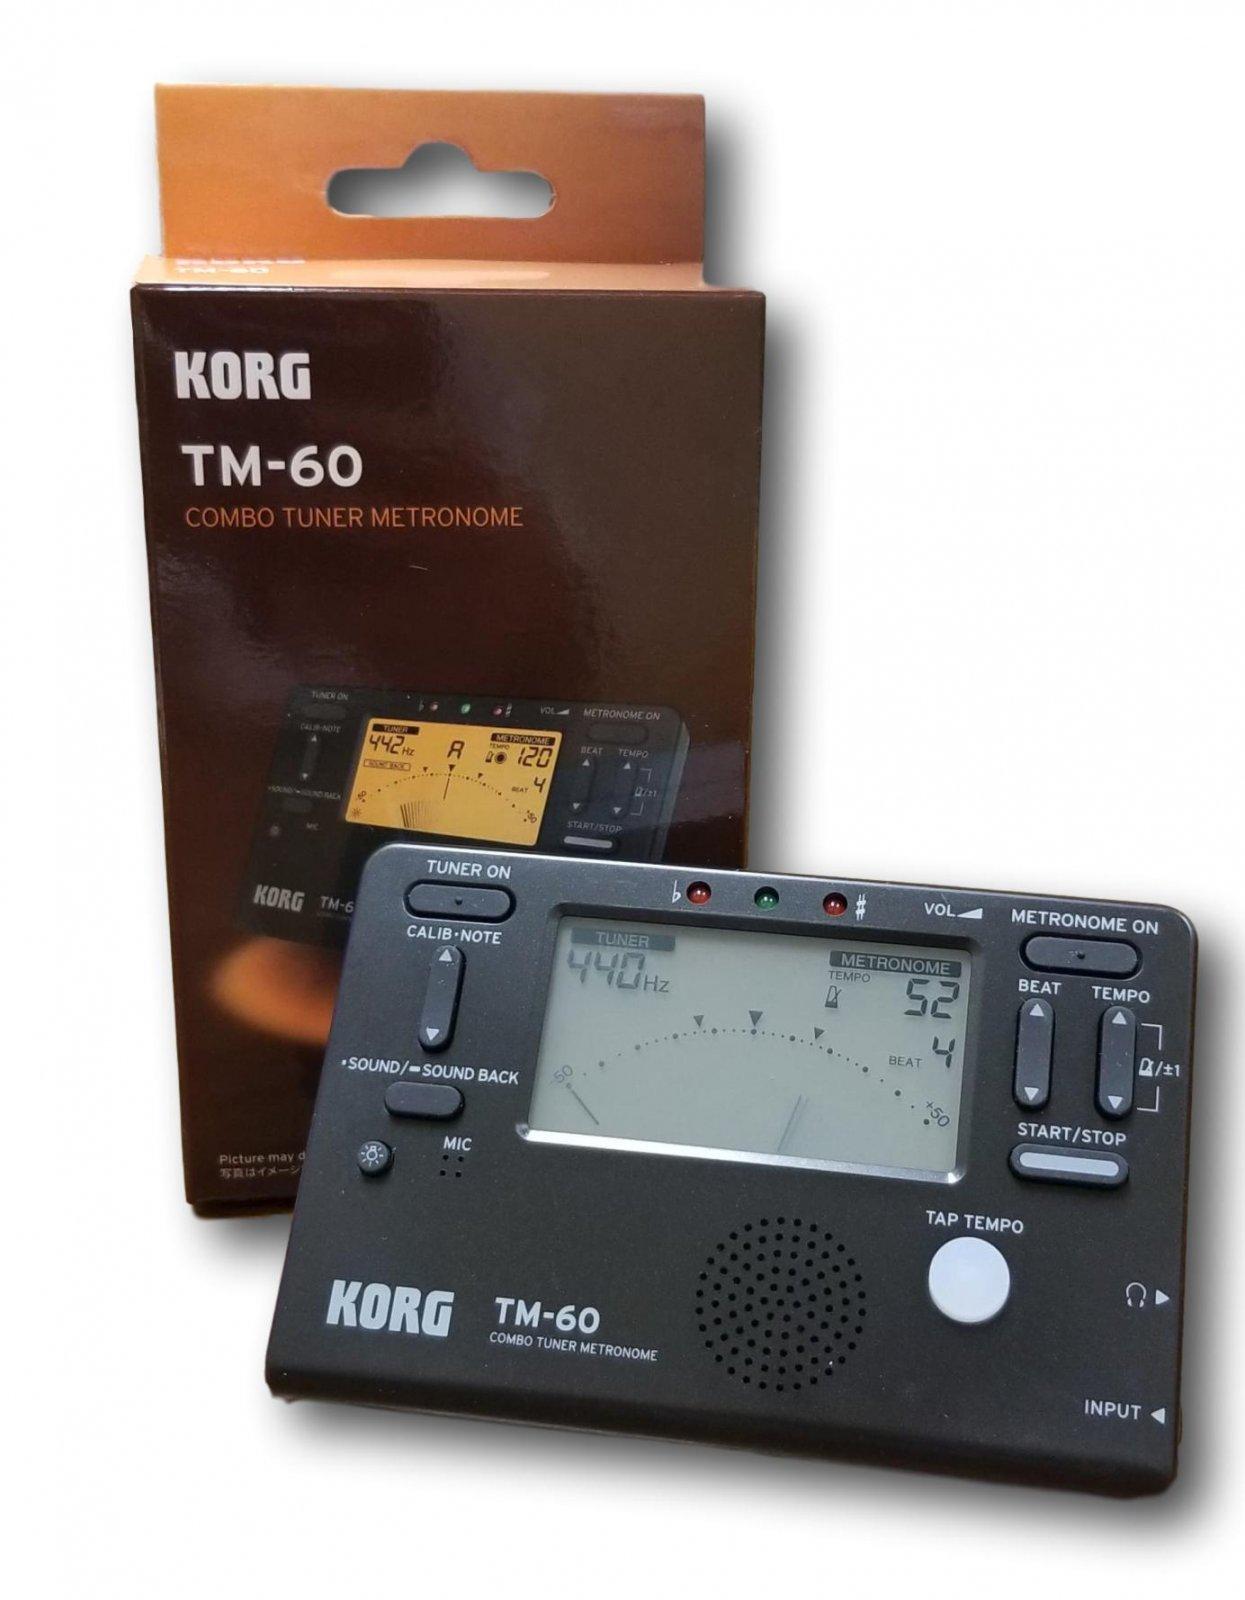 Korg TM-60 Metro/Tuner